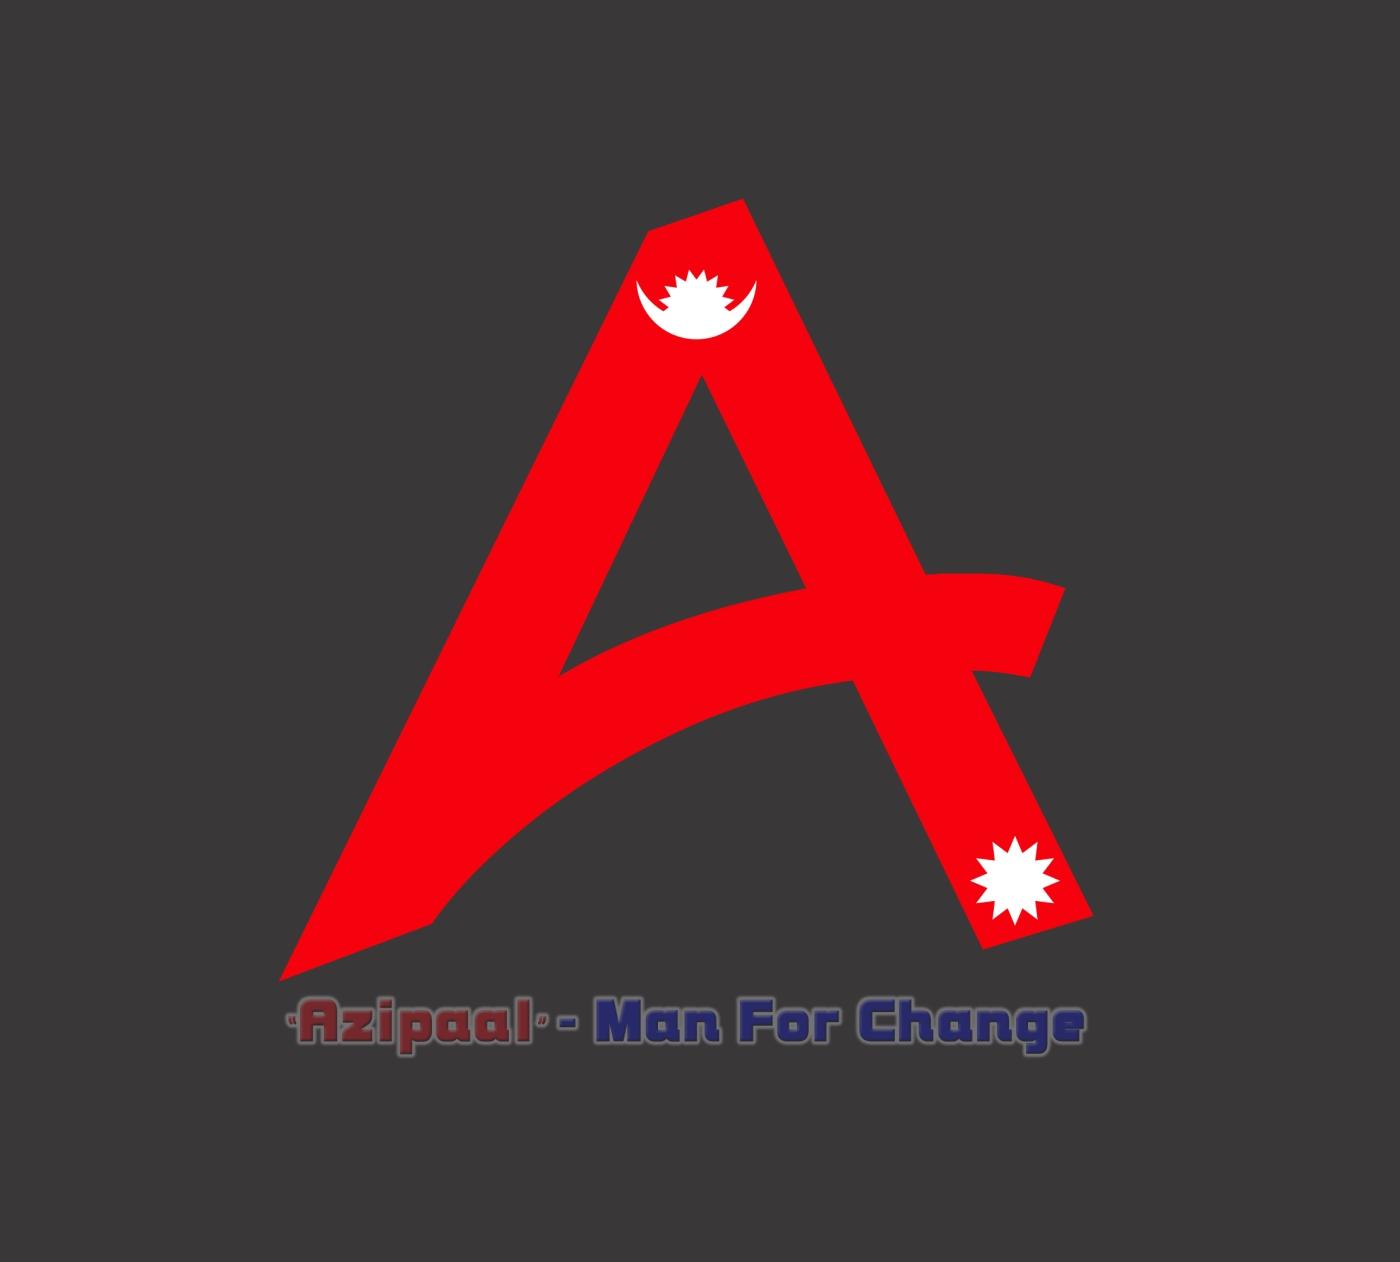 azipaal-logo